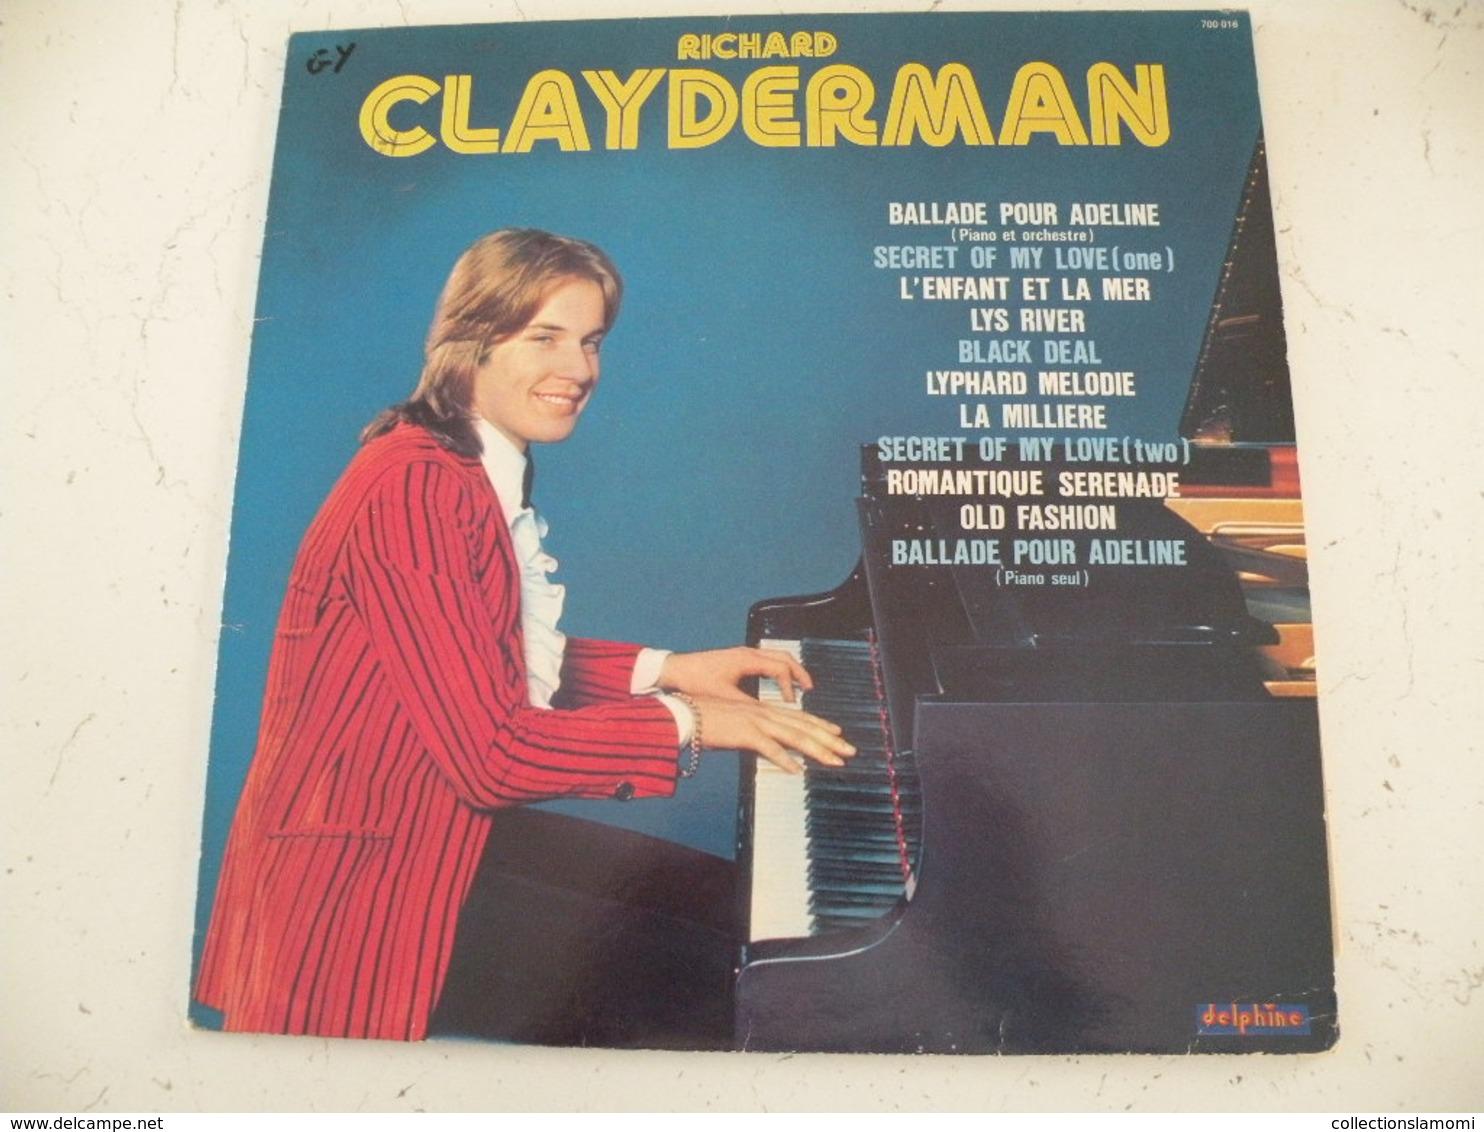 Richard Clayderman 1977 -  (Titres Sur Photos) - Vinyle Album 33T - Instrumental